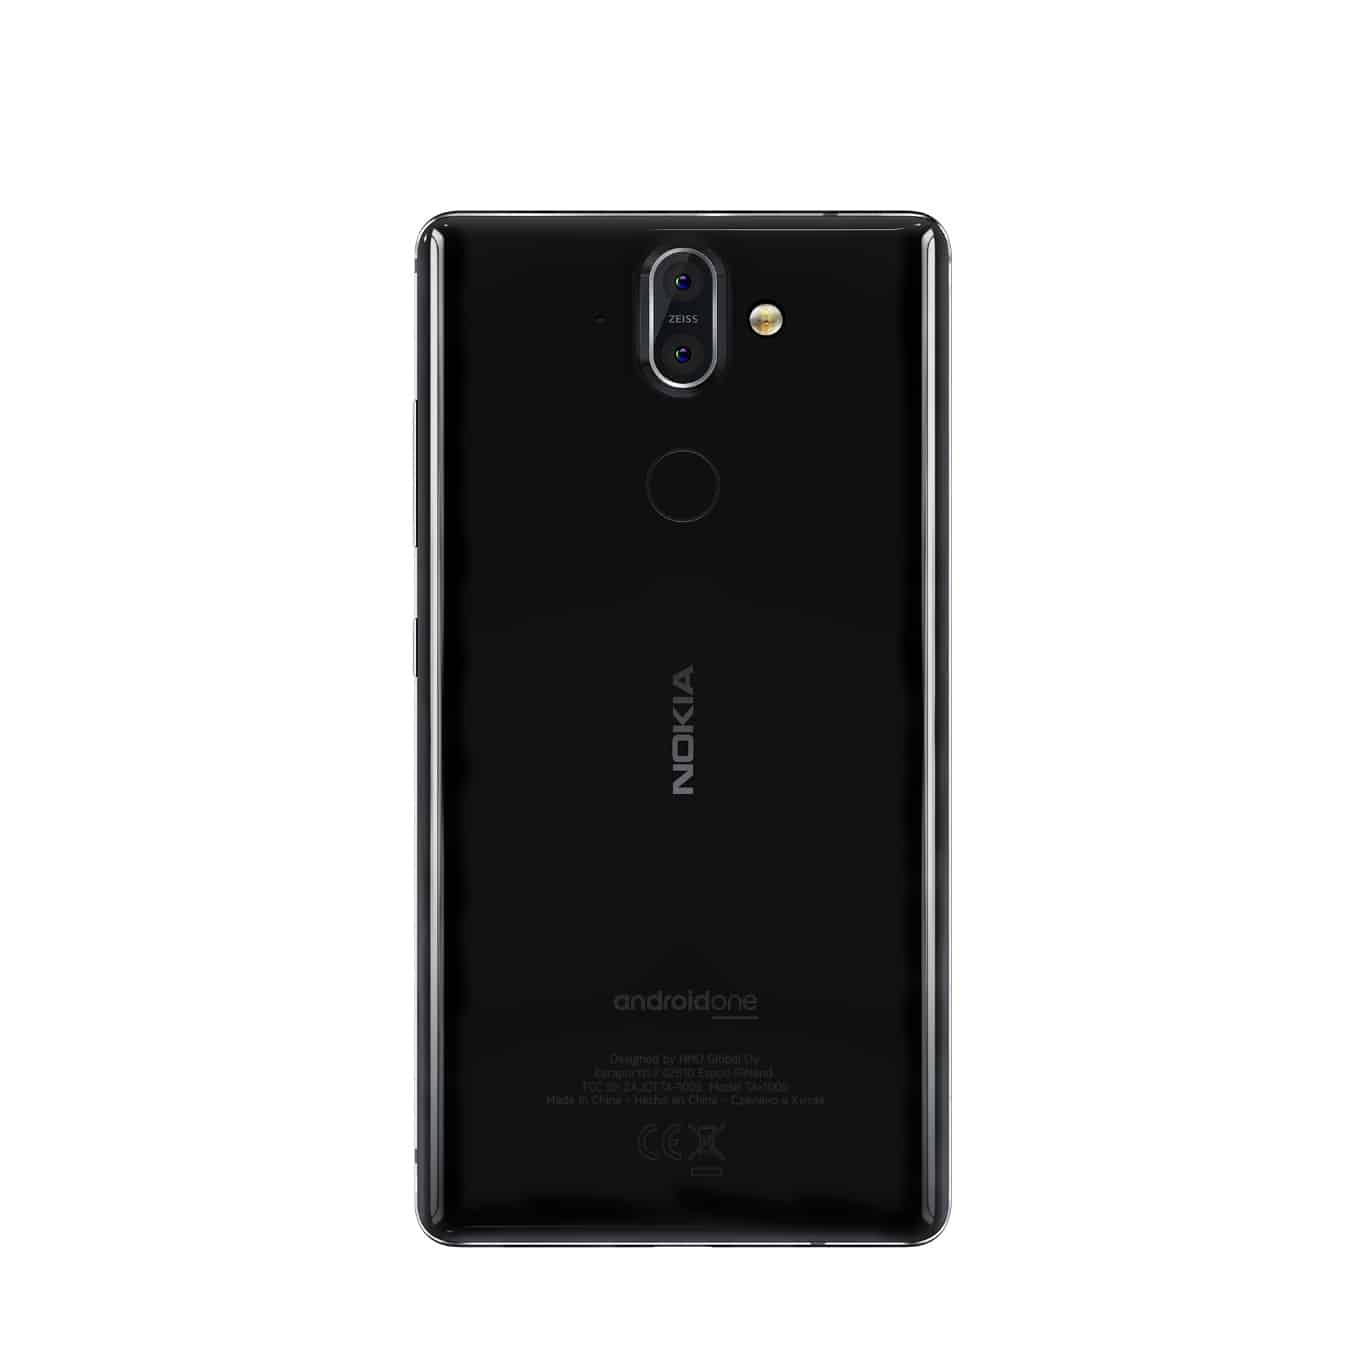 Nokia 8 Sirocco image 4